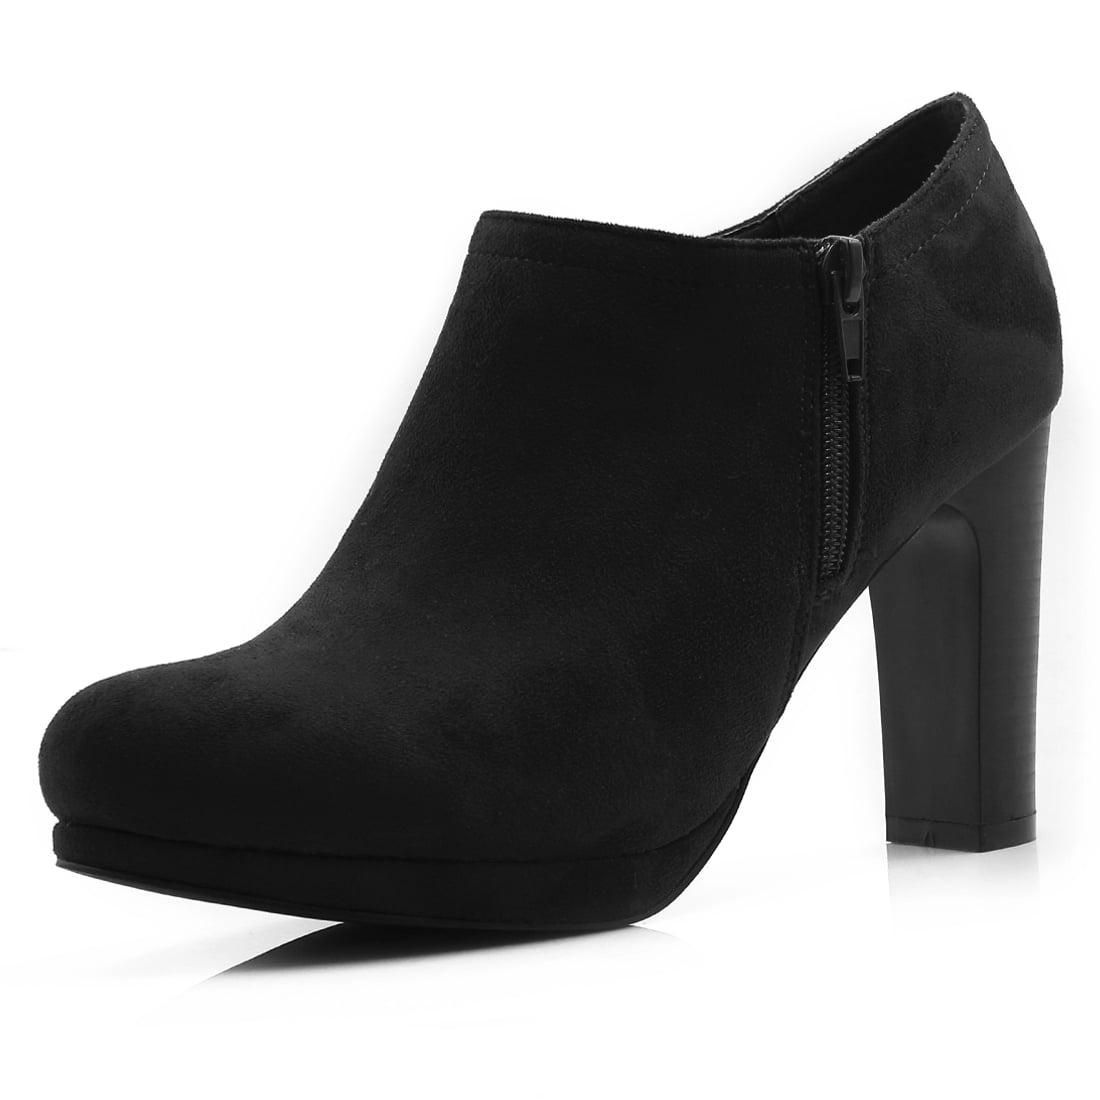 Women's Round Toe Zipper Side High Heel Ankle Boots Black US 7